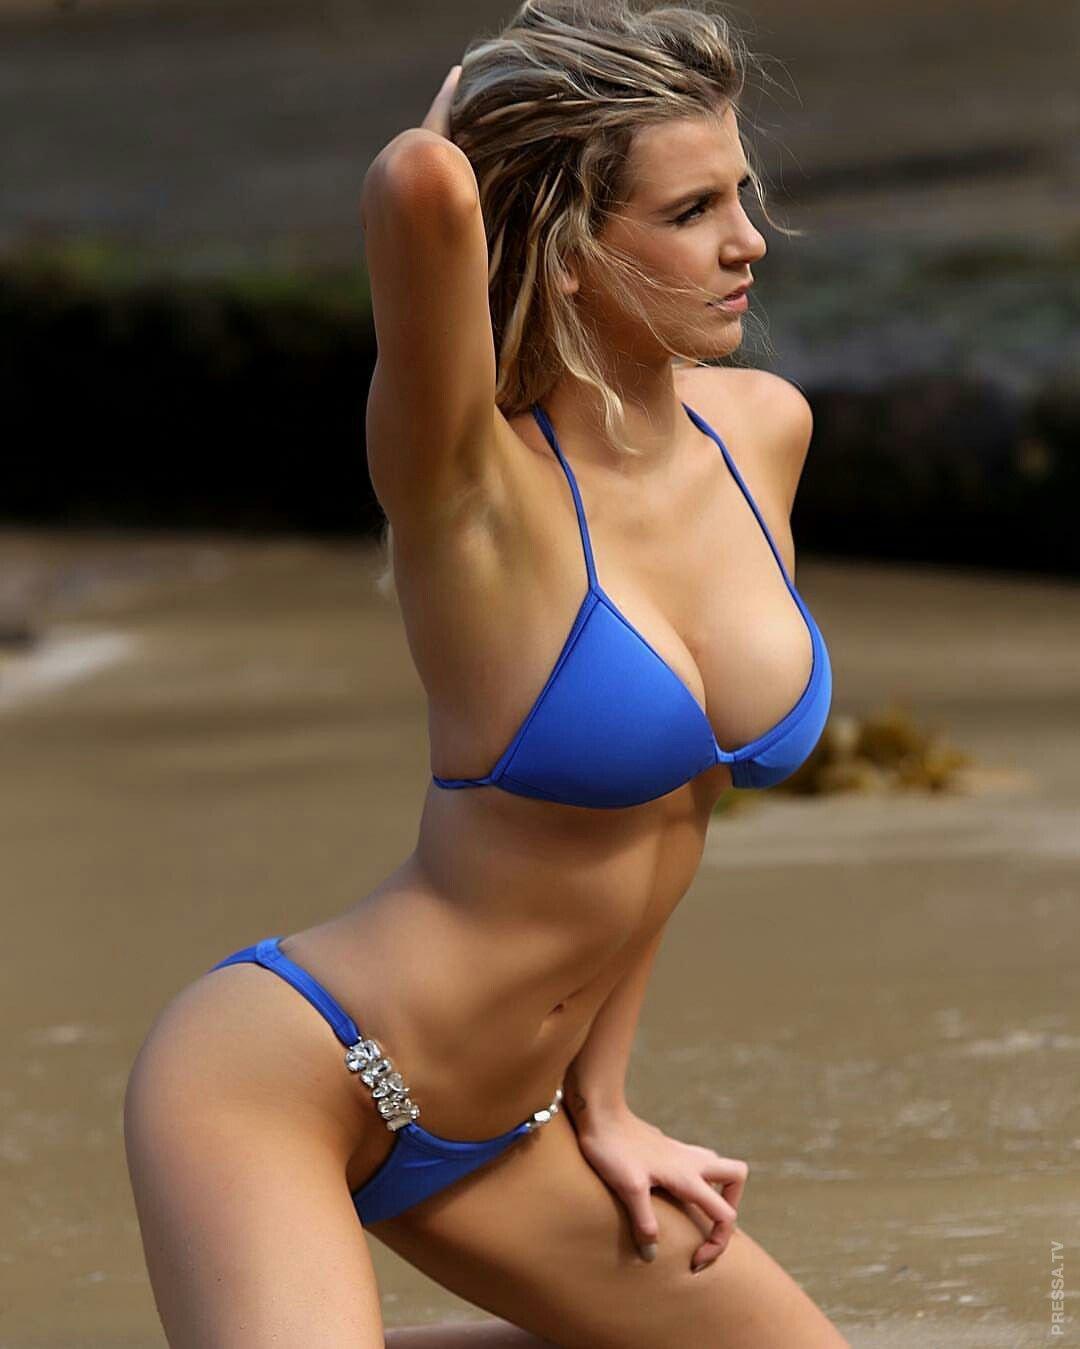 Stream bikini babes